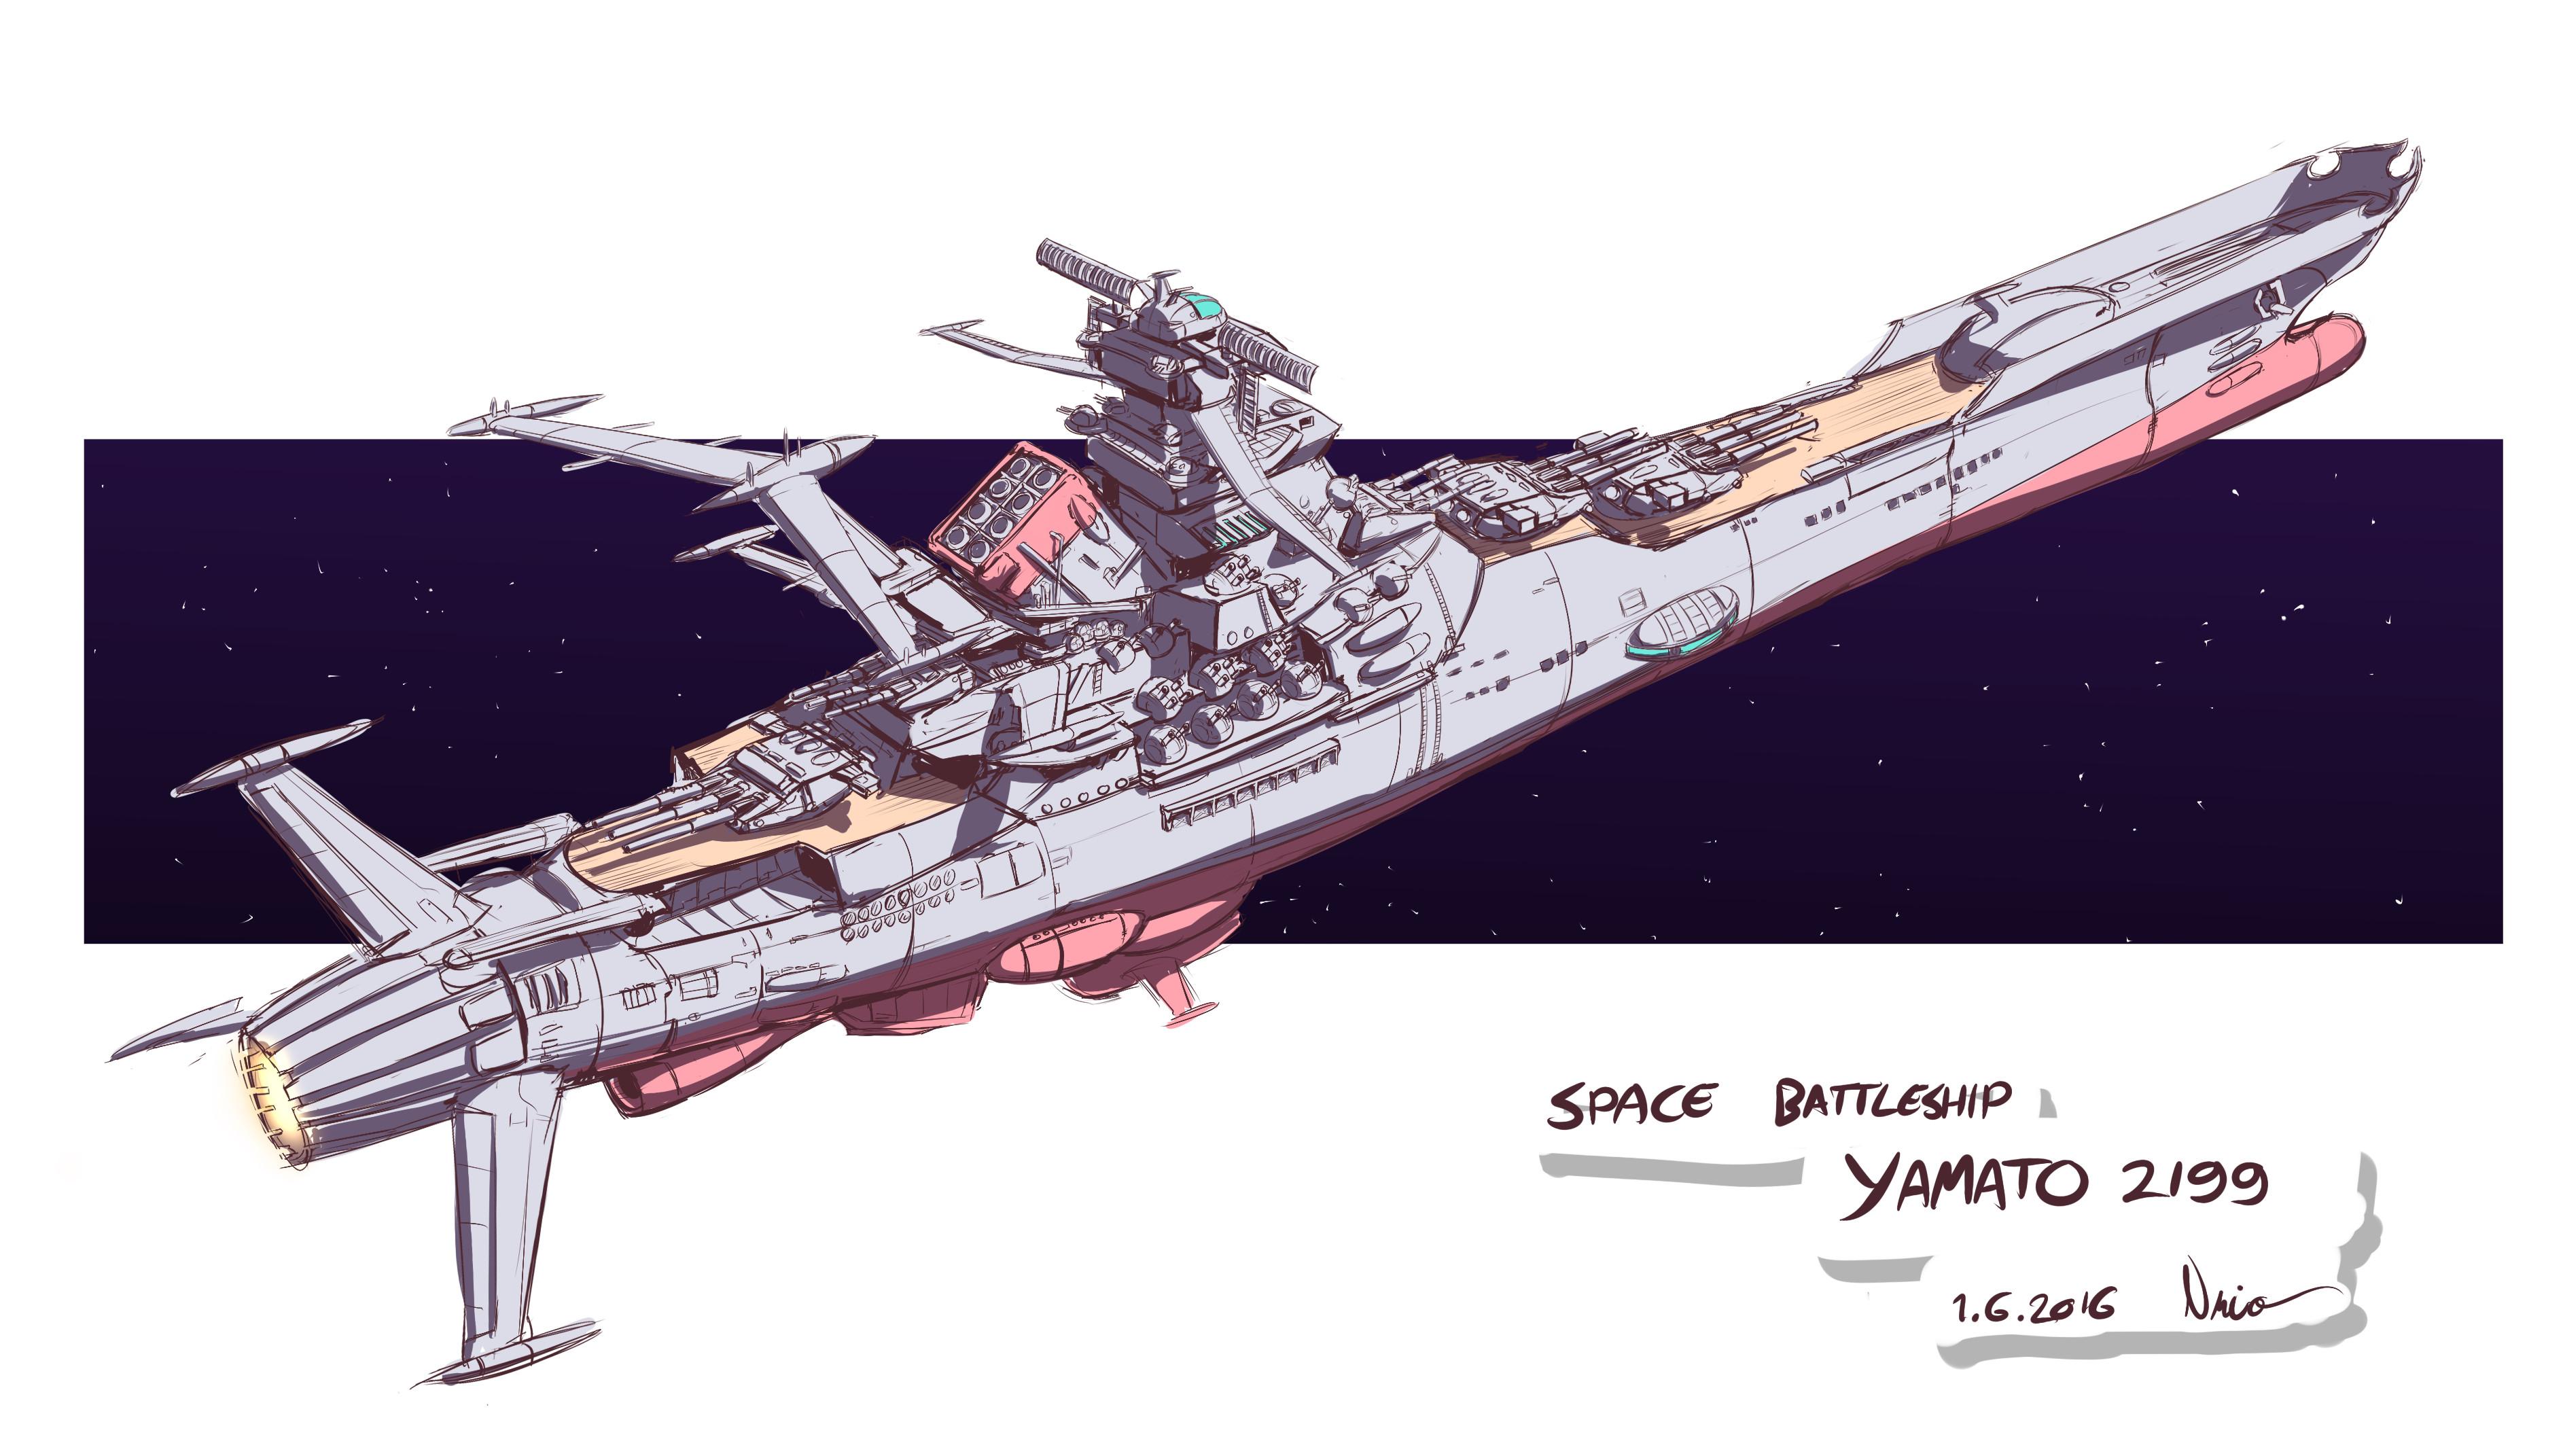 Sby2e1c48 Space Battleship Yamato 2199 Episode 1 Clipart Big